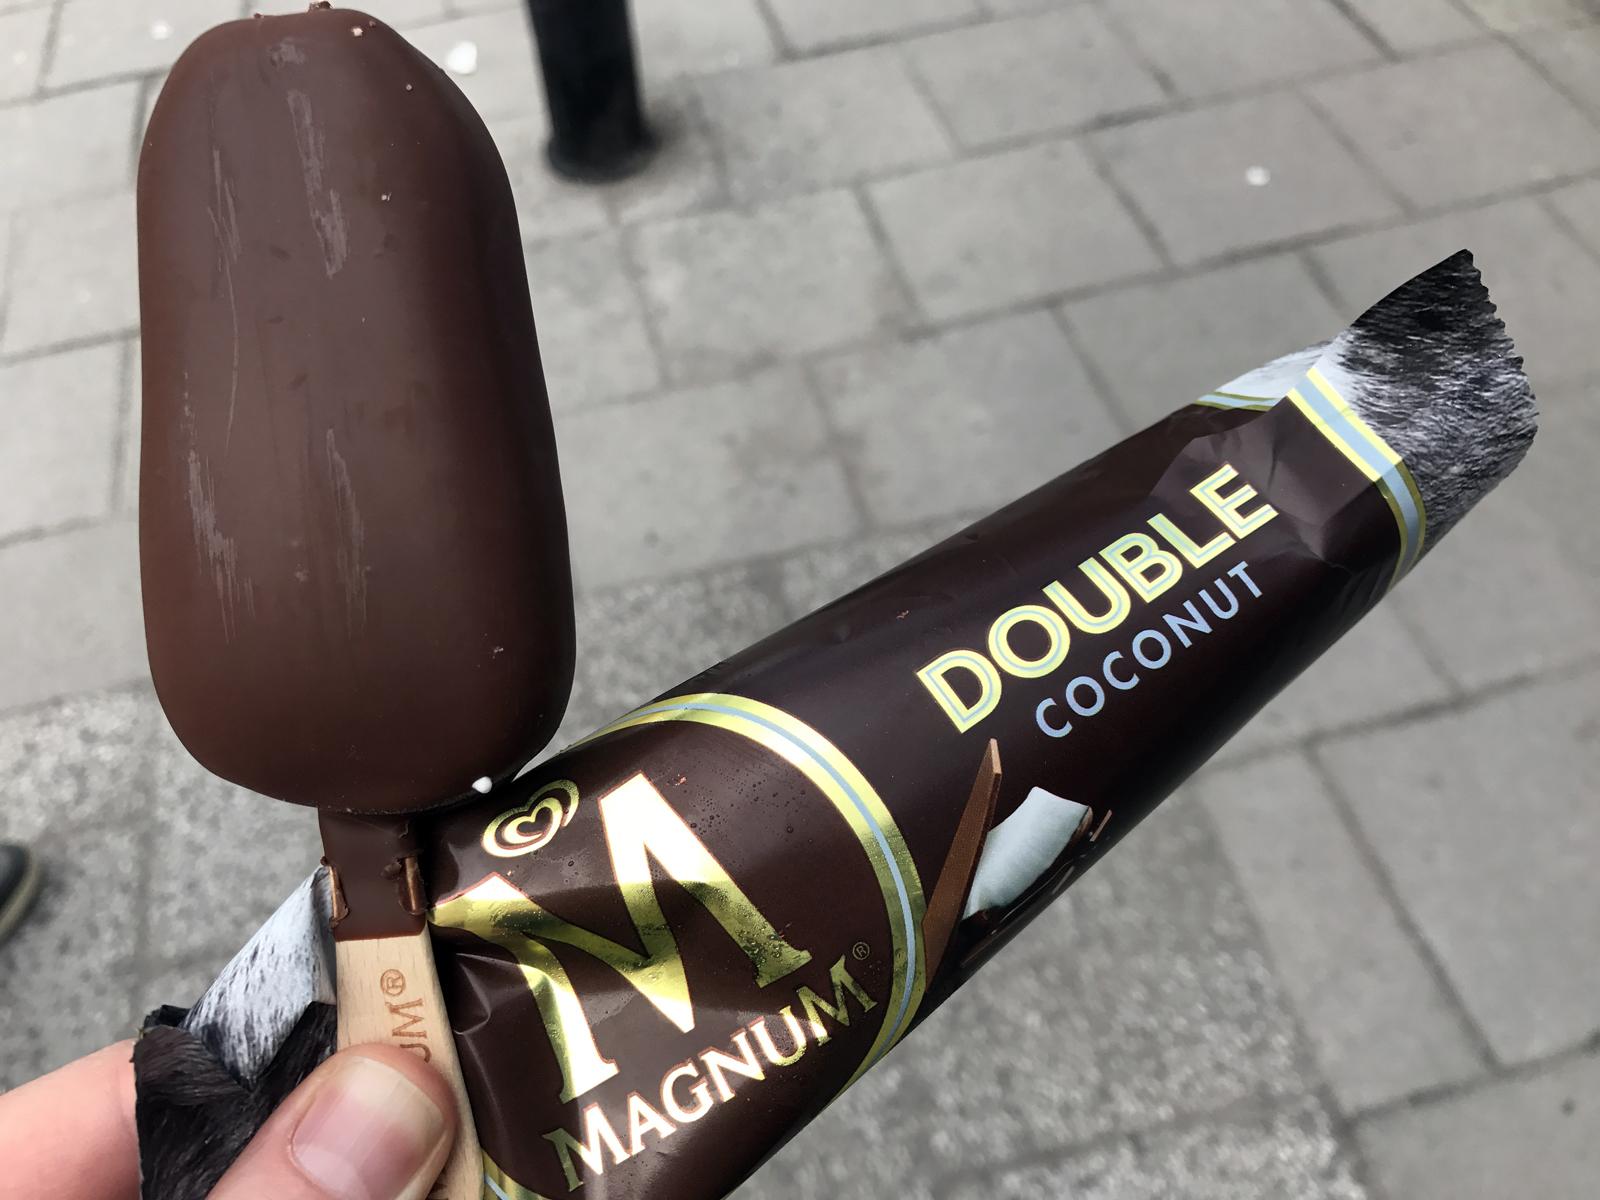 Magnum Double Coconut